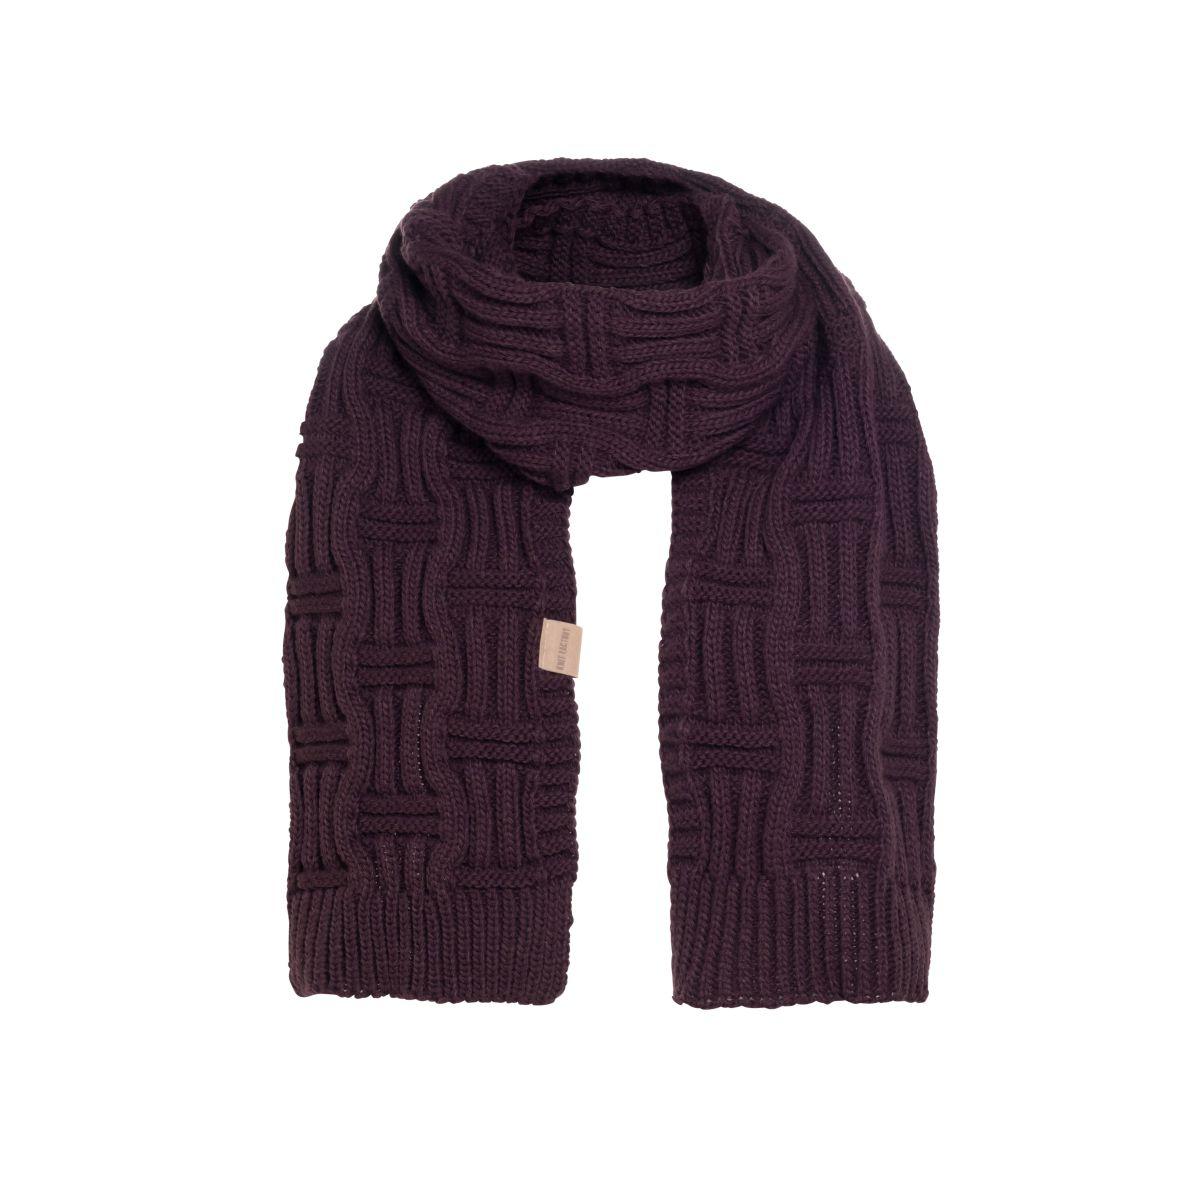 knit factory kf14406502350 bobby sjaal aubergine 1